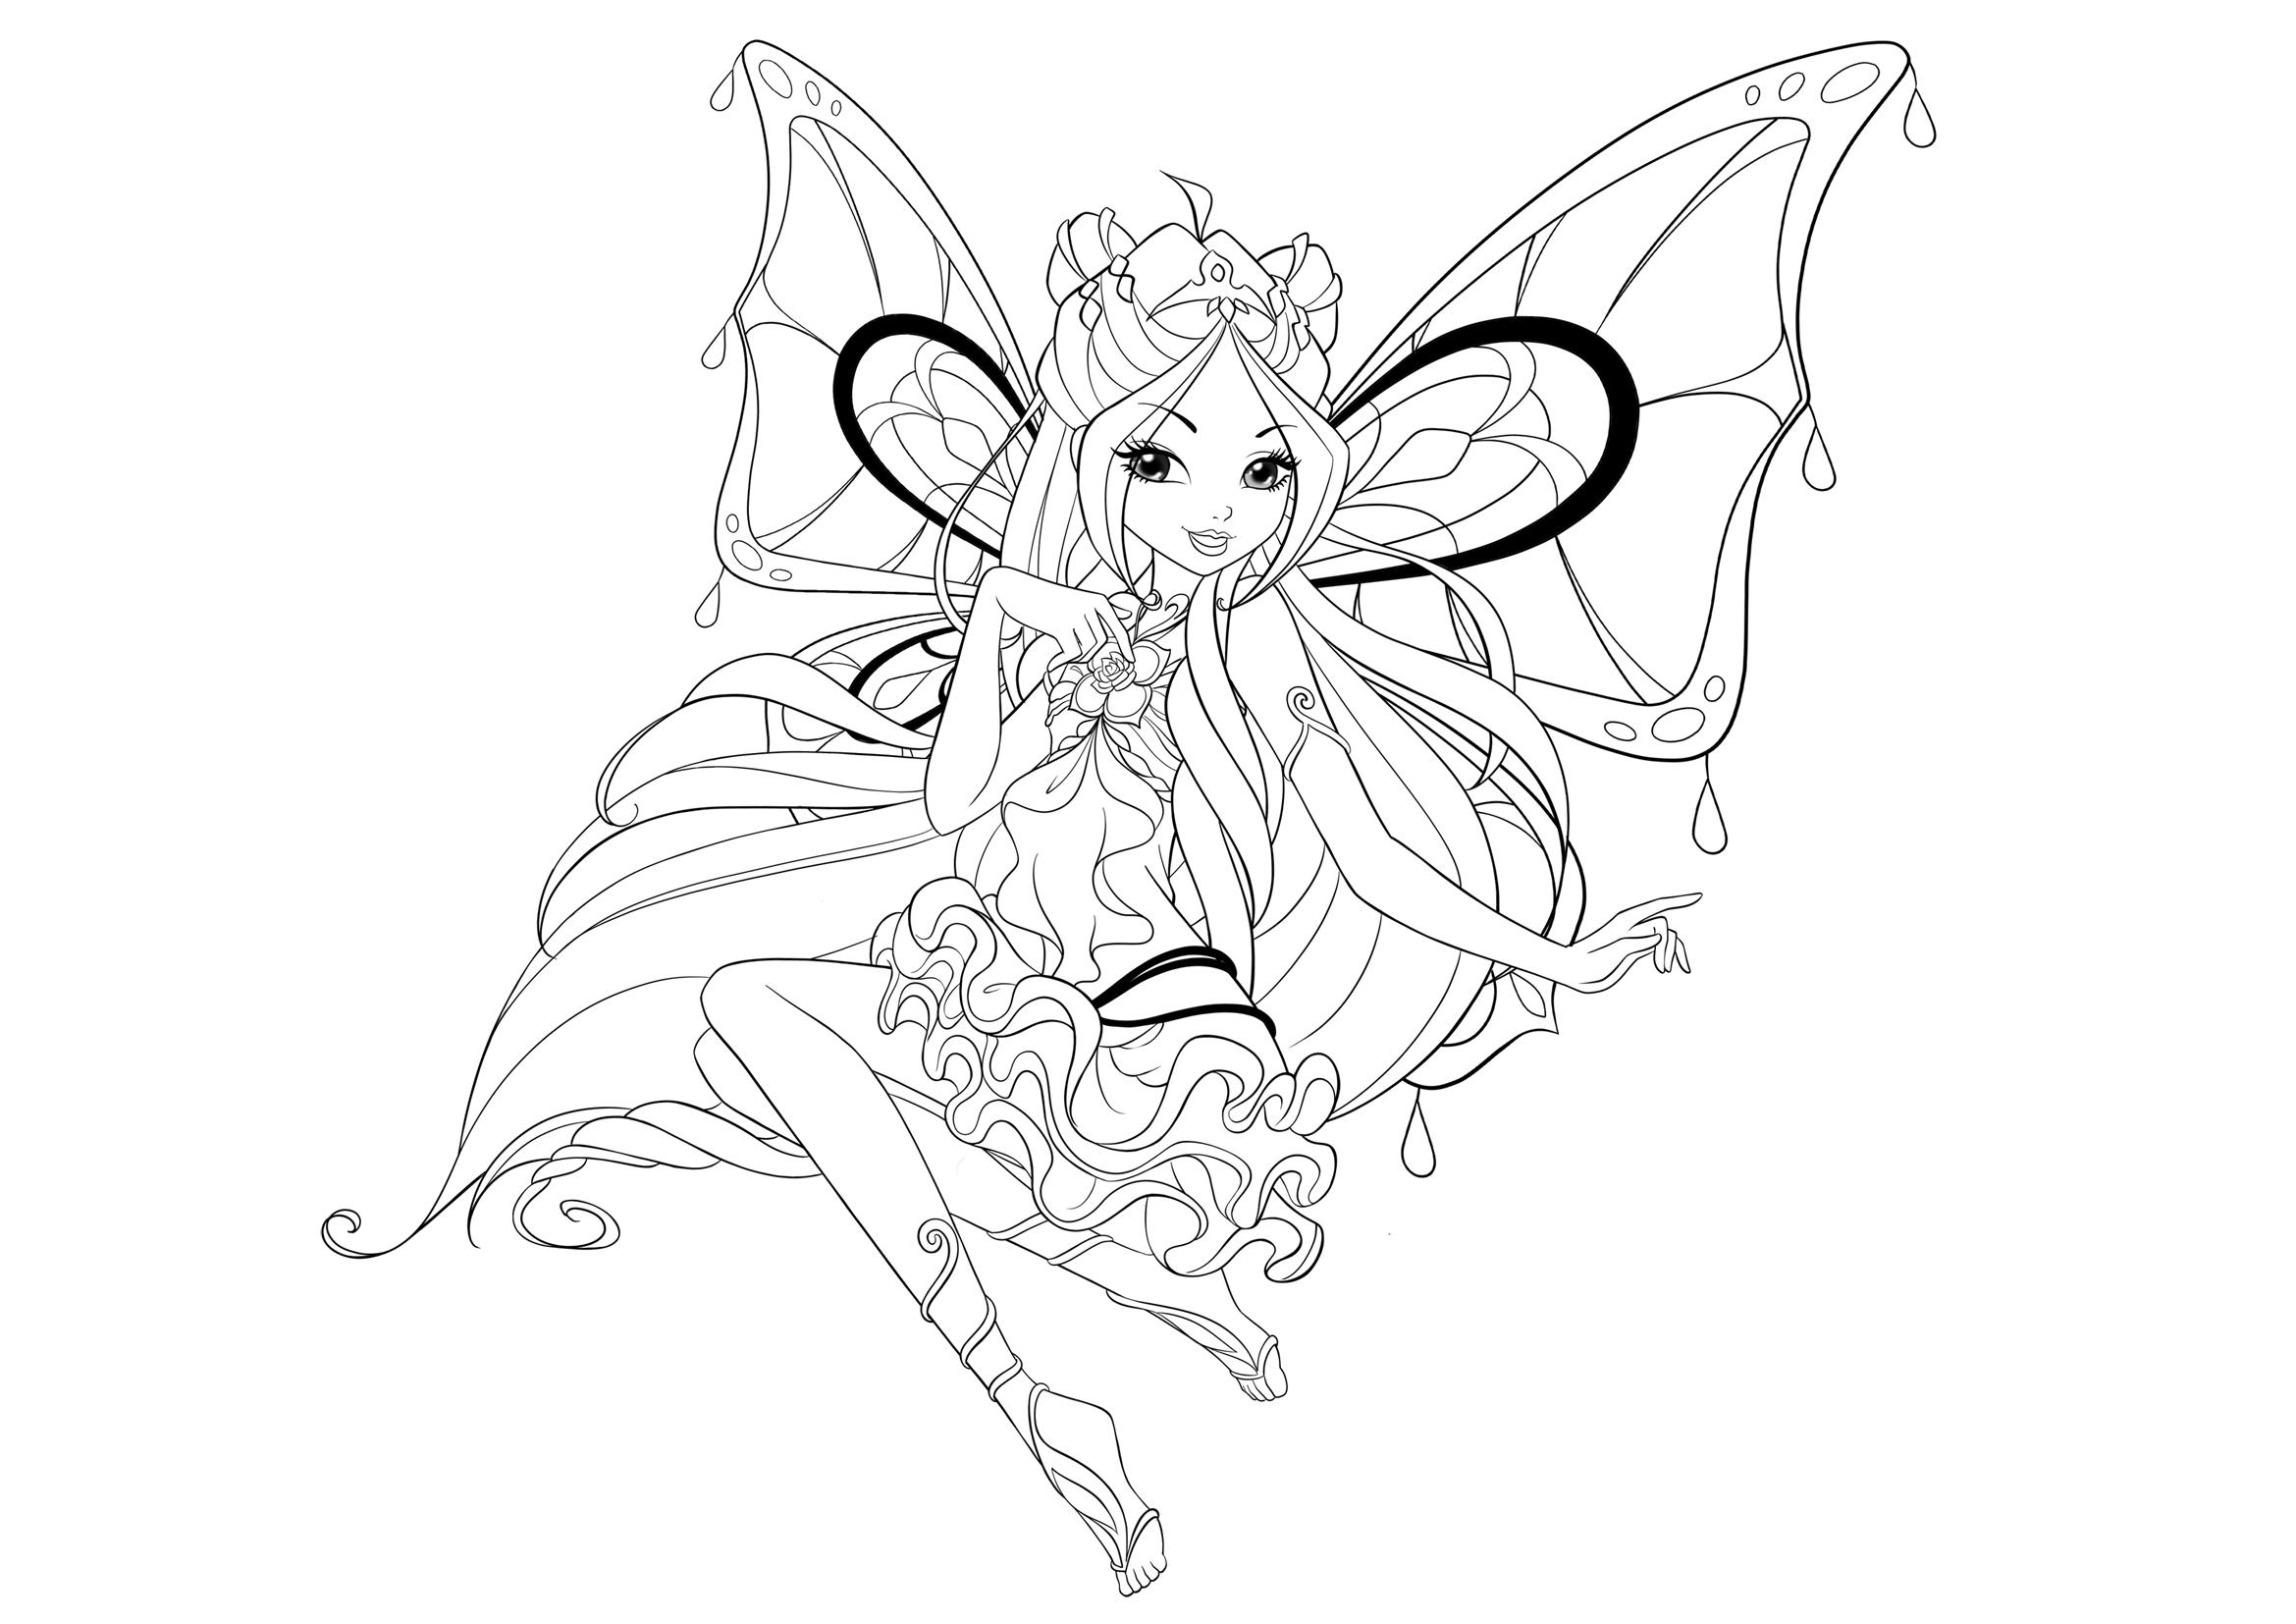 Winx Club Season 8 Enchantix Coloring Pages Youloveit Com